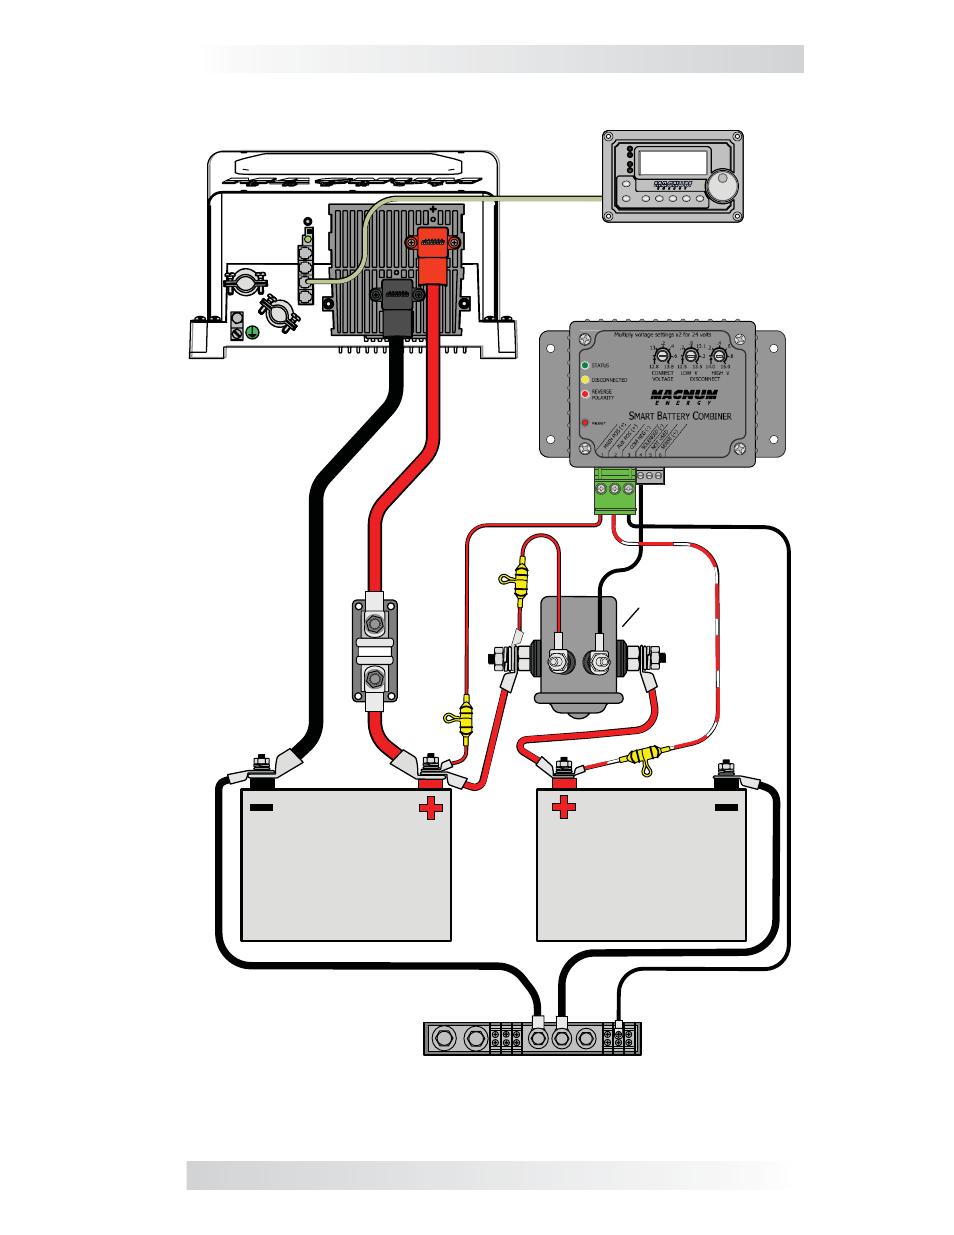 Installation, Figure 2-6, solenoid drive, O n /o f f ... on